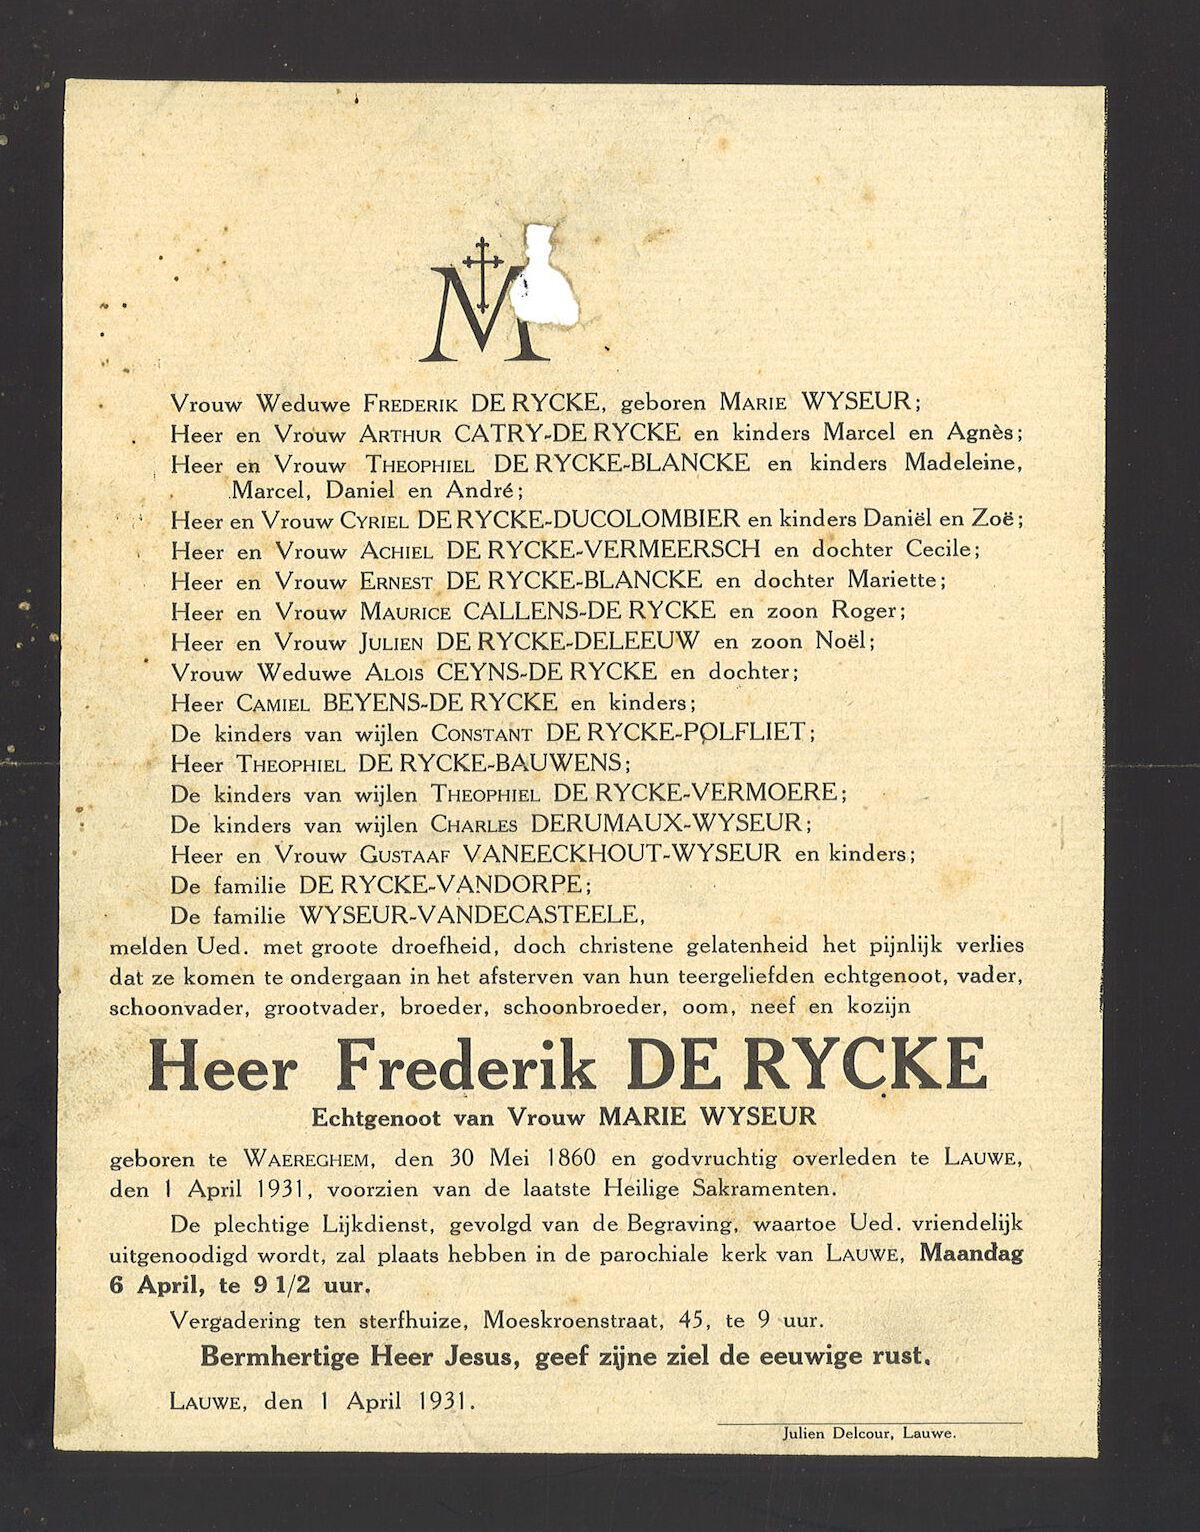 Frederik De Rycke